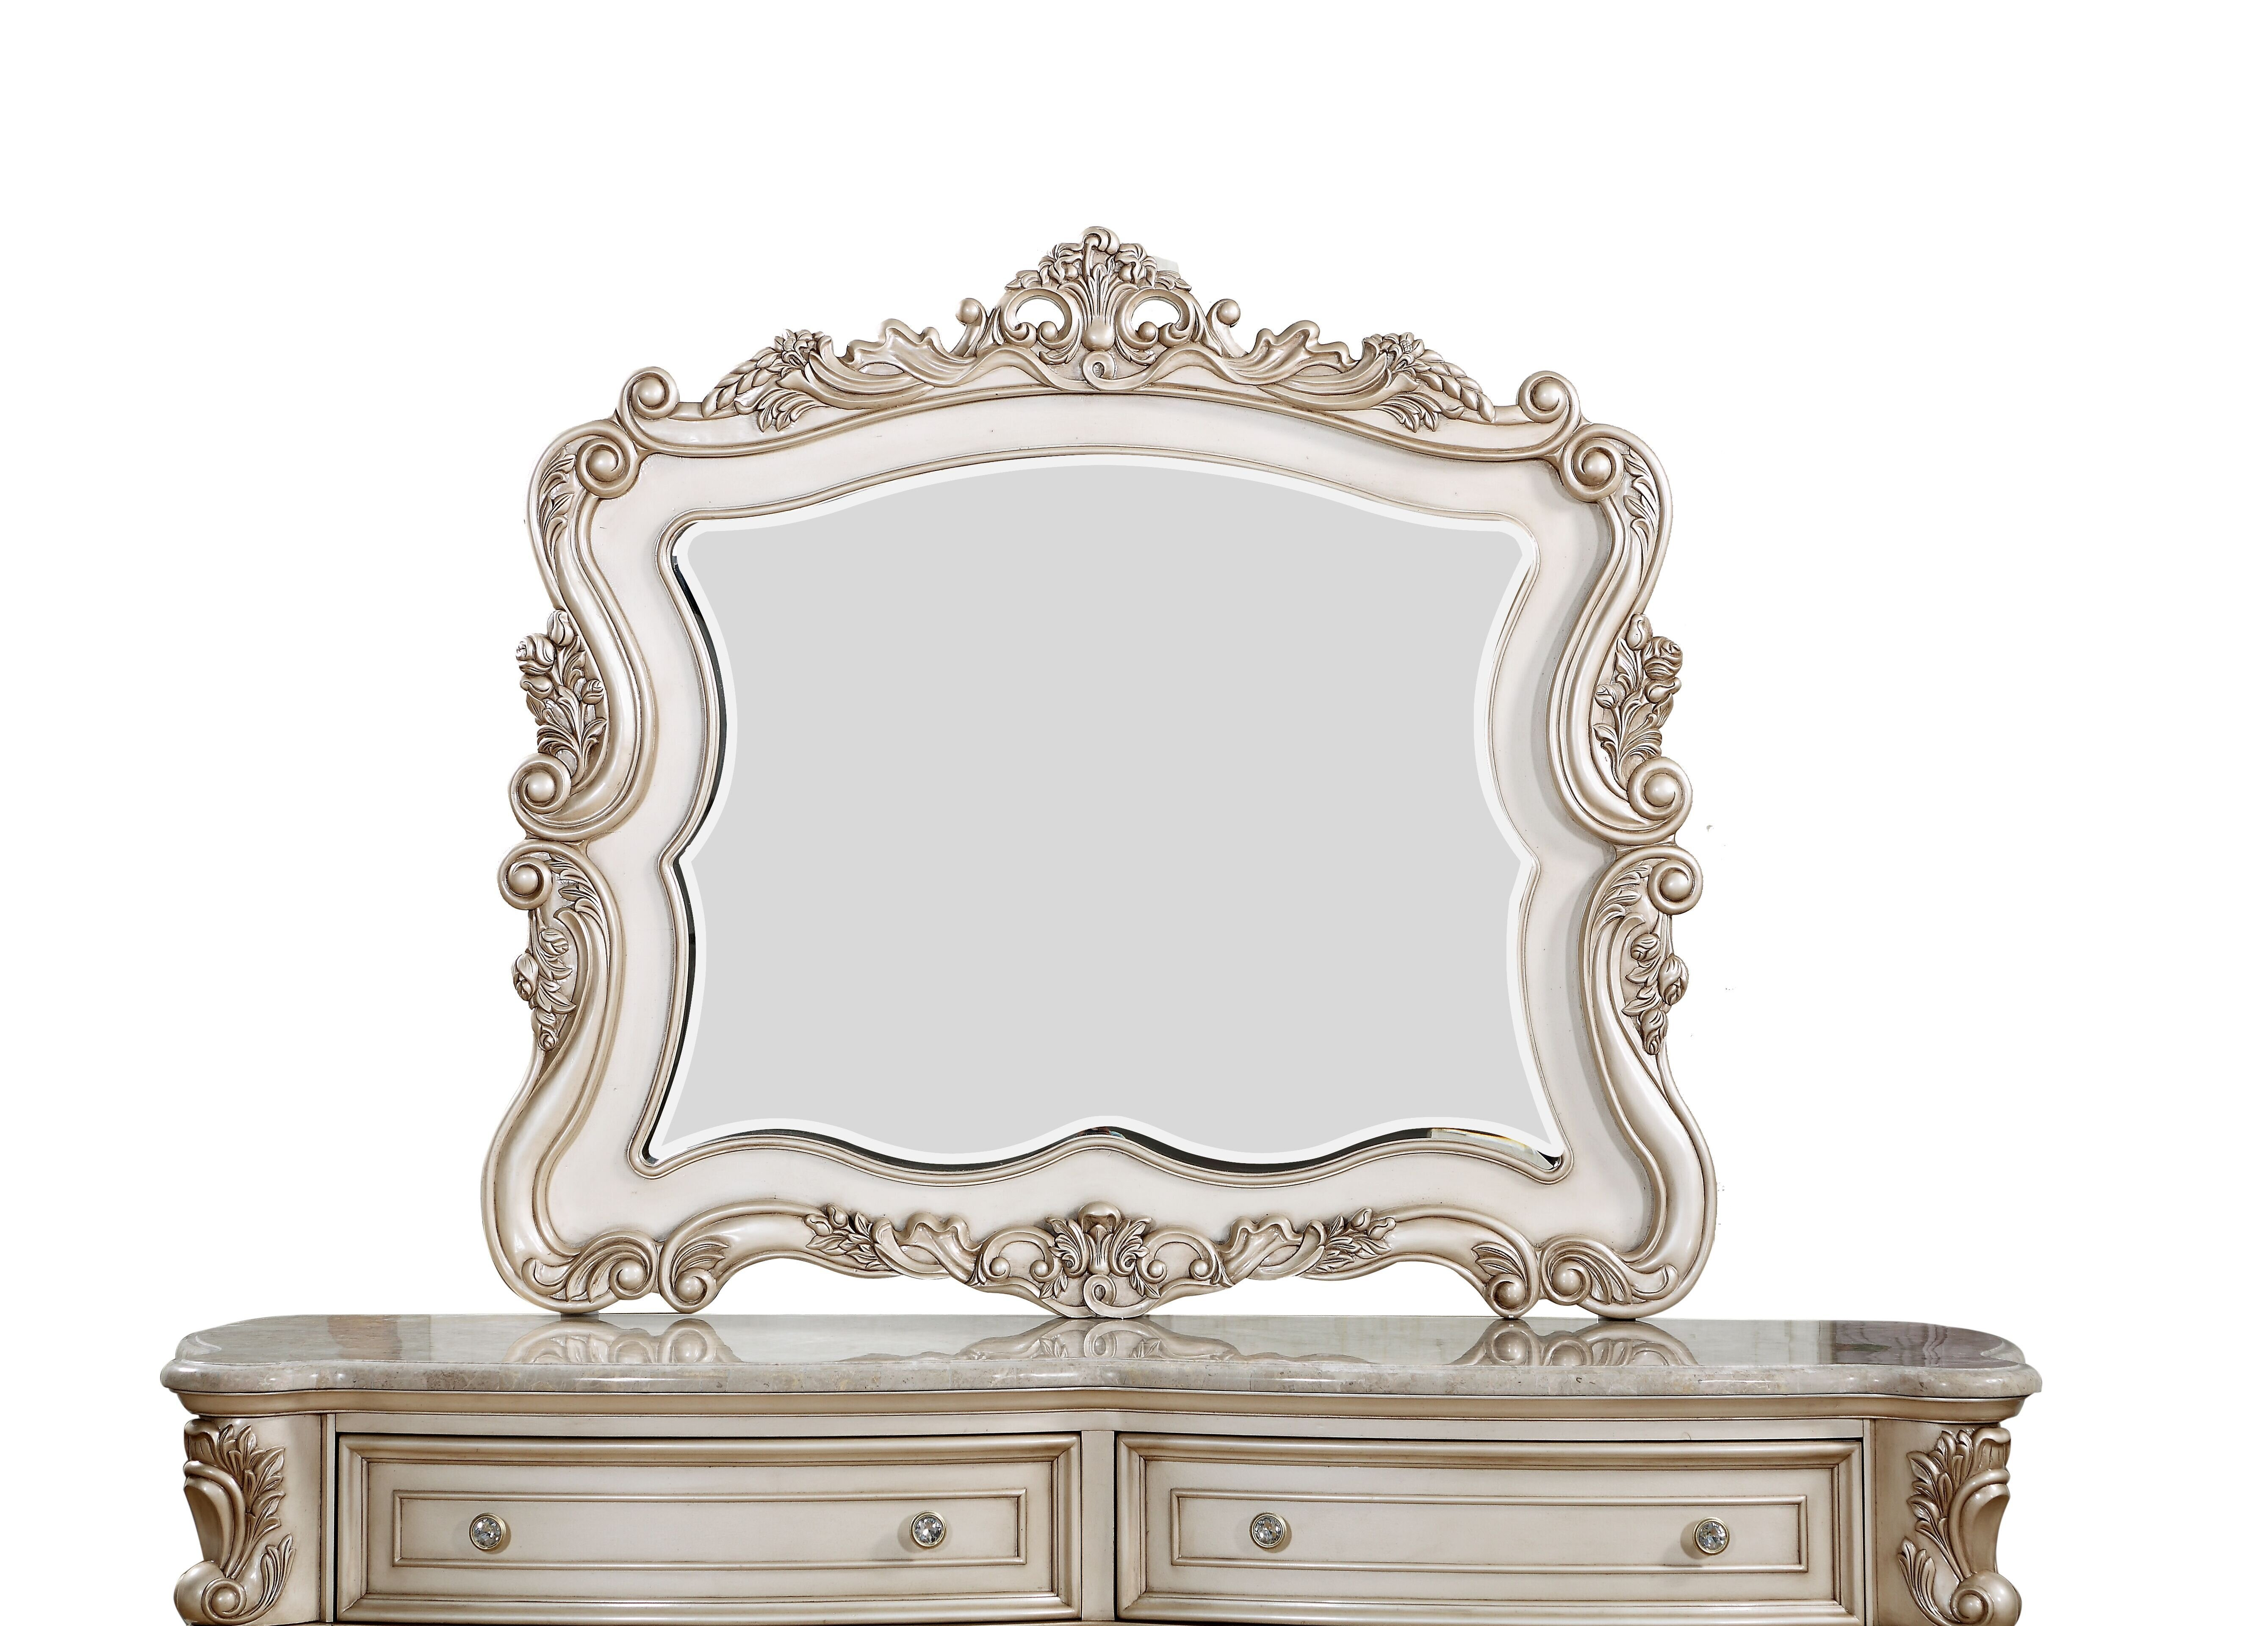 Irregular Mounts To Dresser Mirrors You Ll Love In 2021 Wayfair